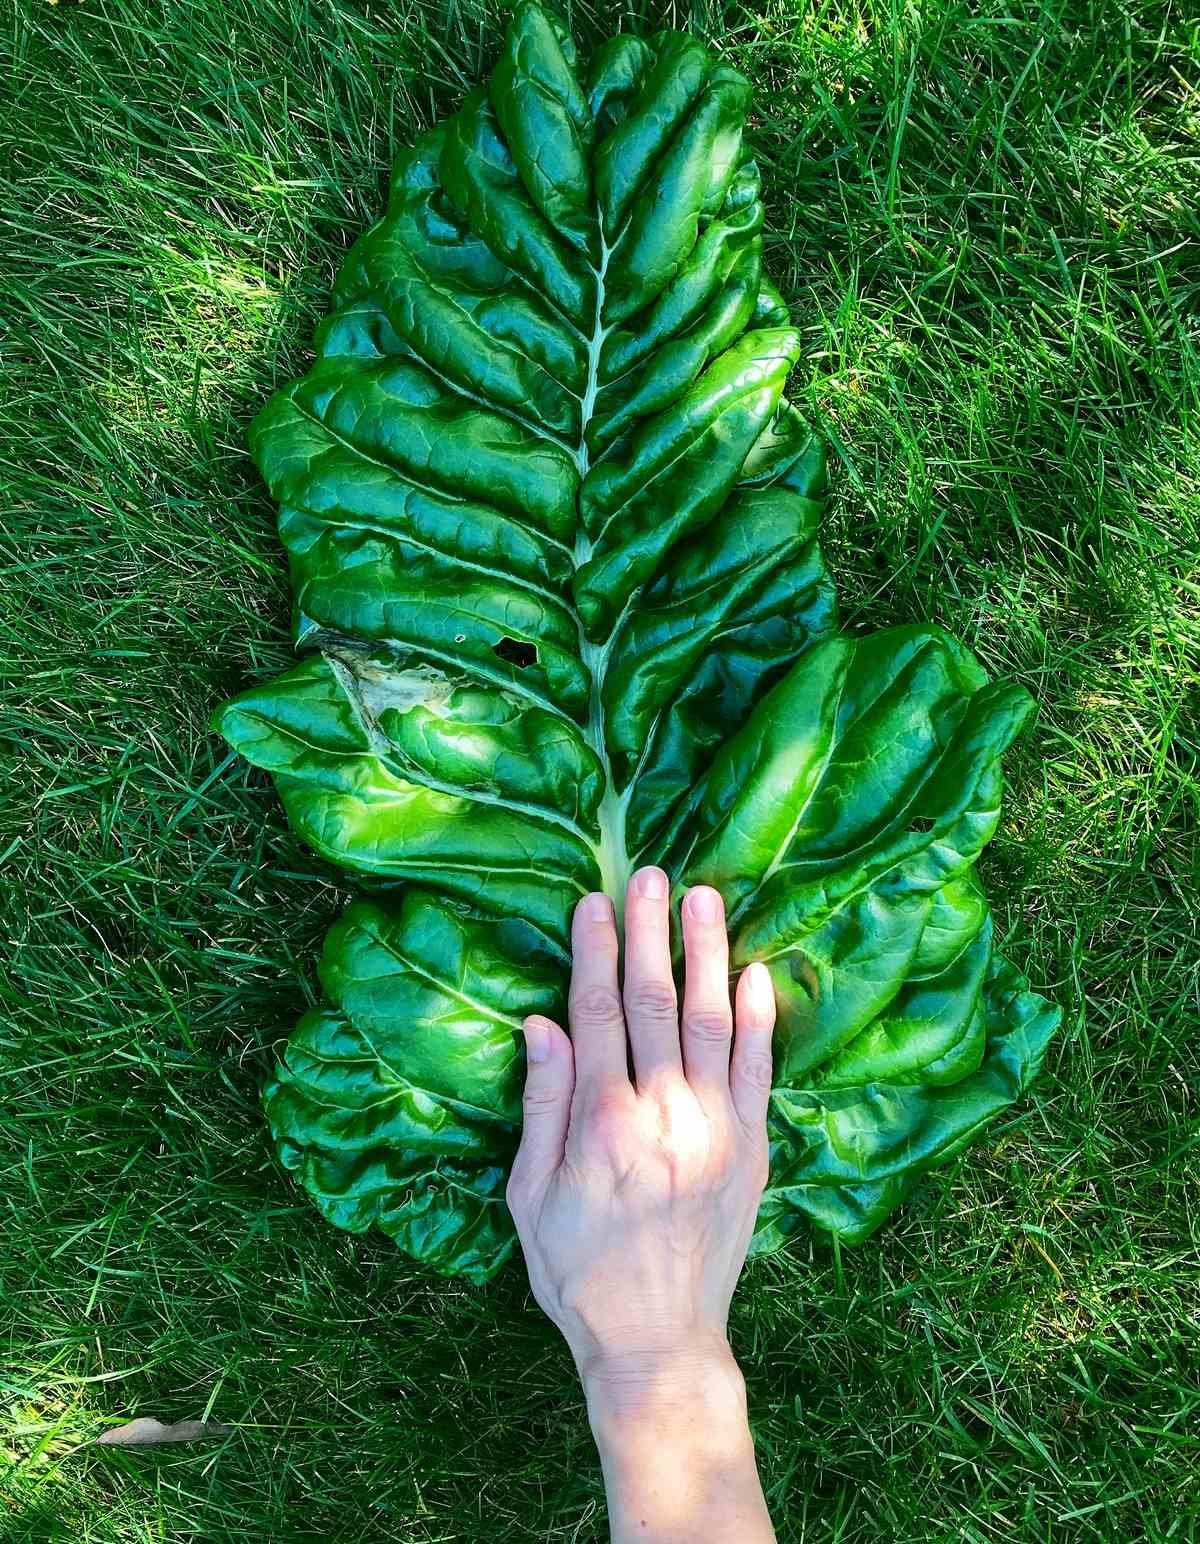 A hand over a large Swiss chard leaf.